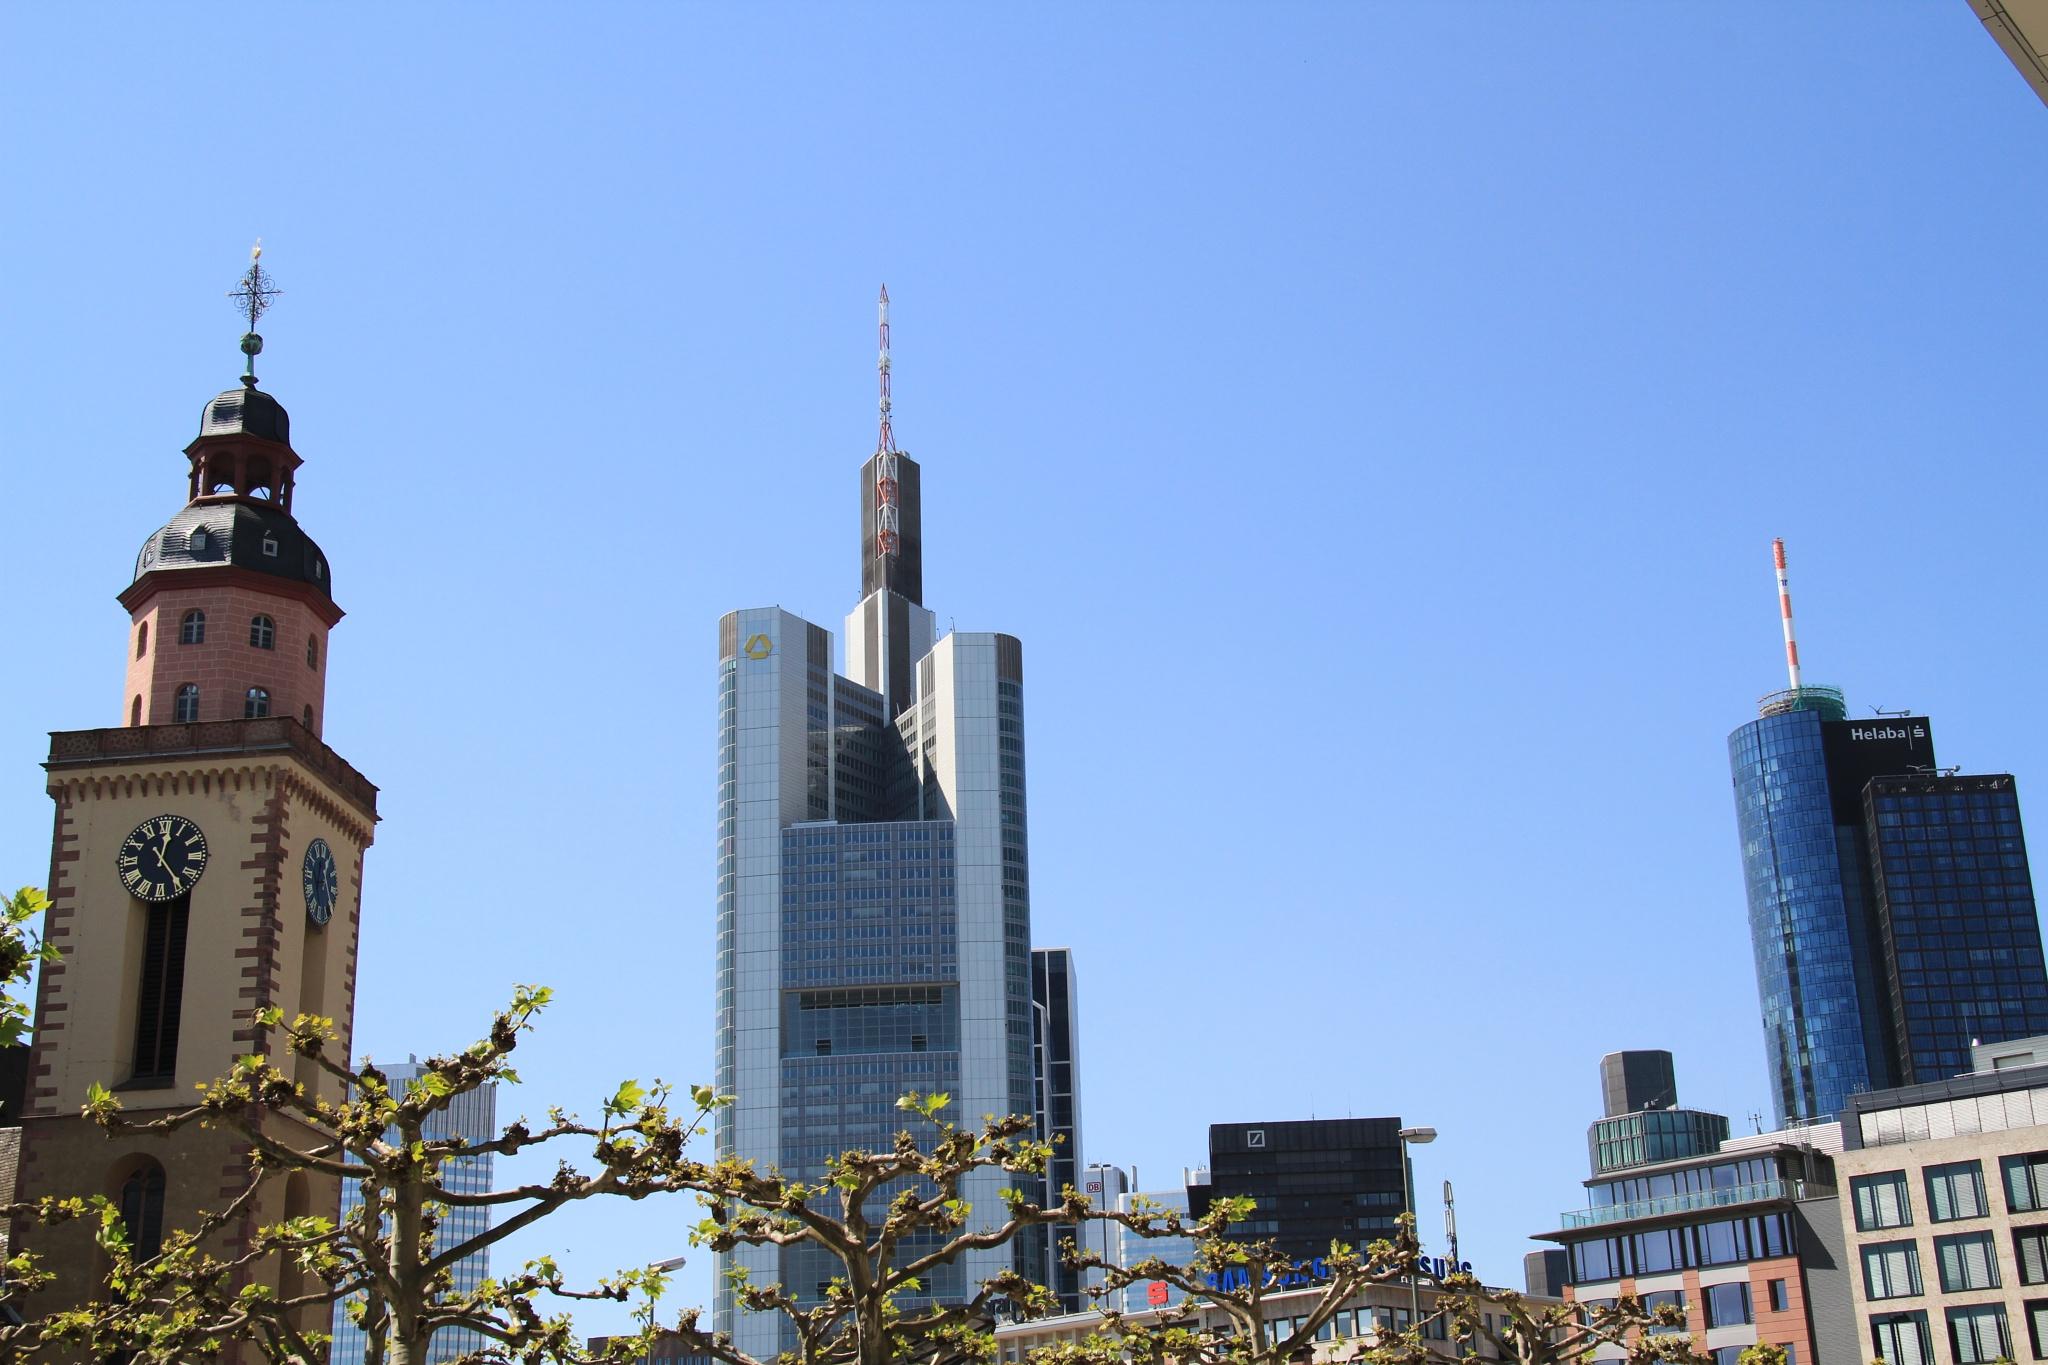 Frankfurt am Main by ozgurkugu